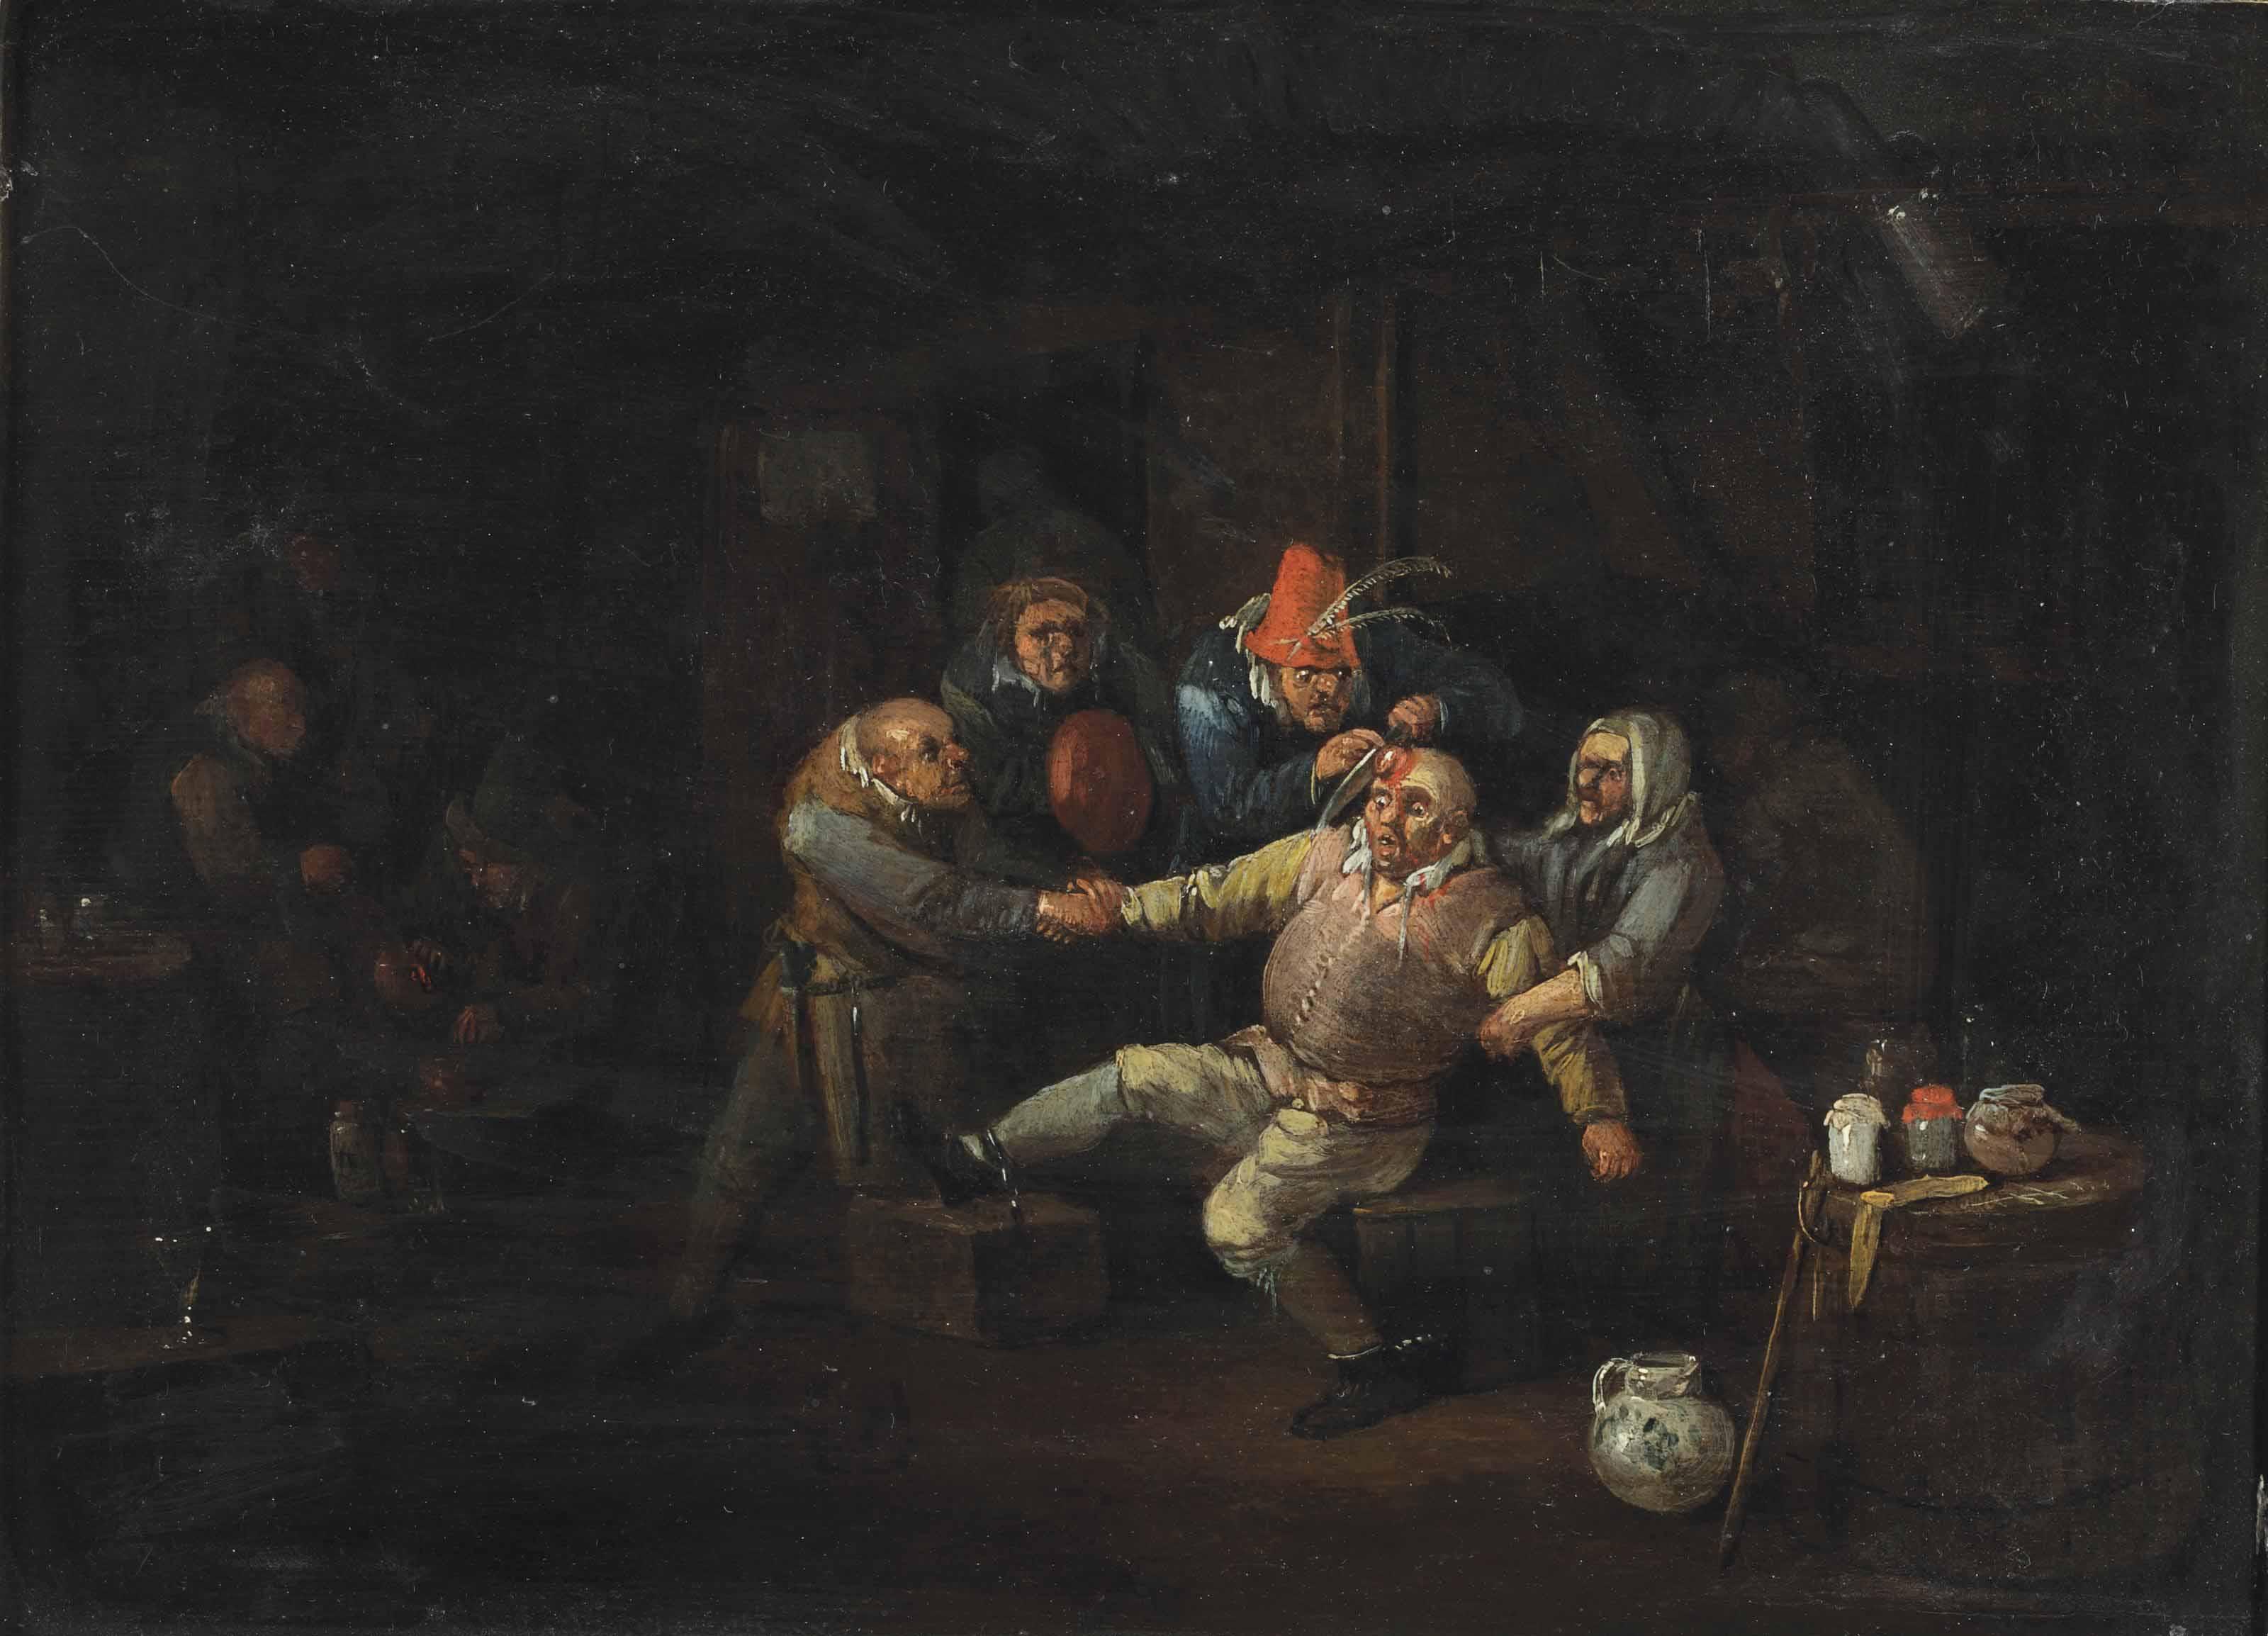 The surgeon's visit